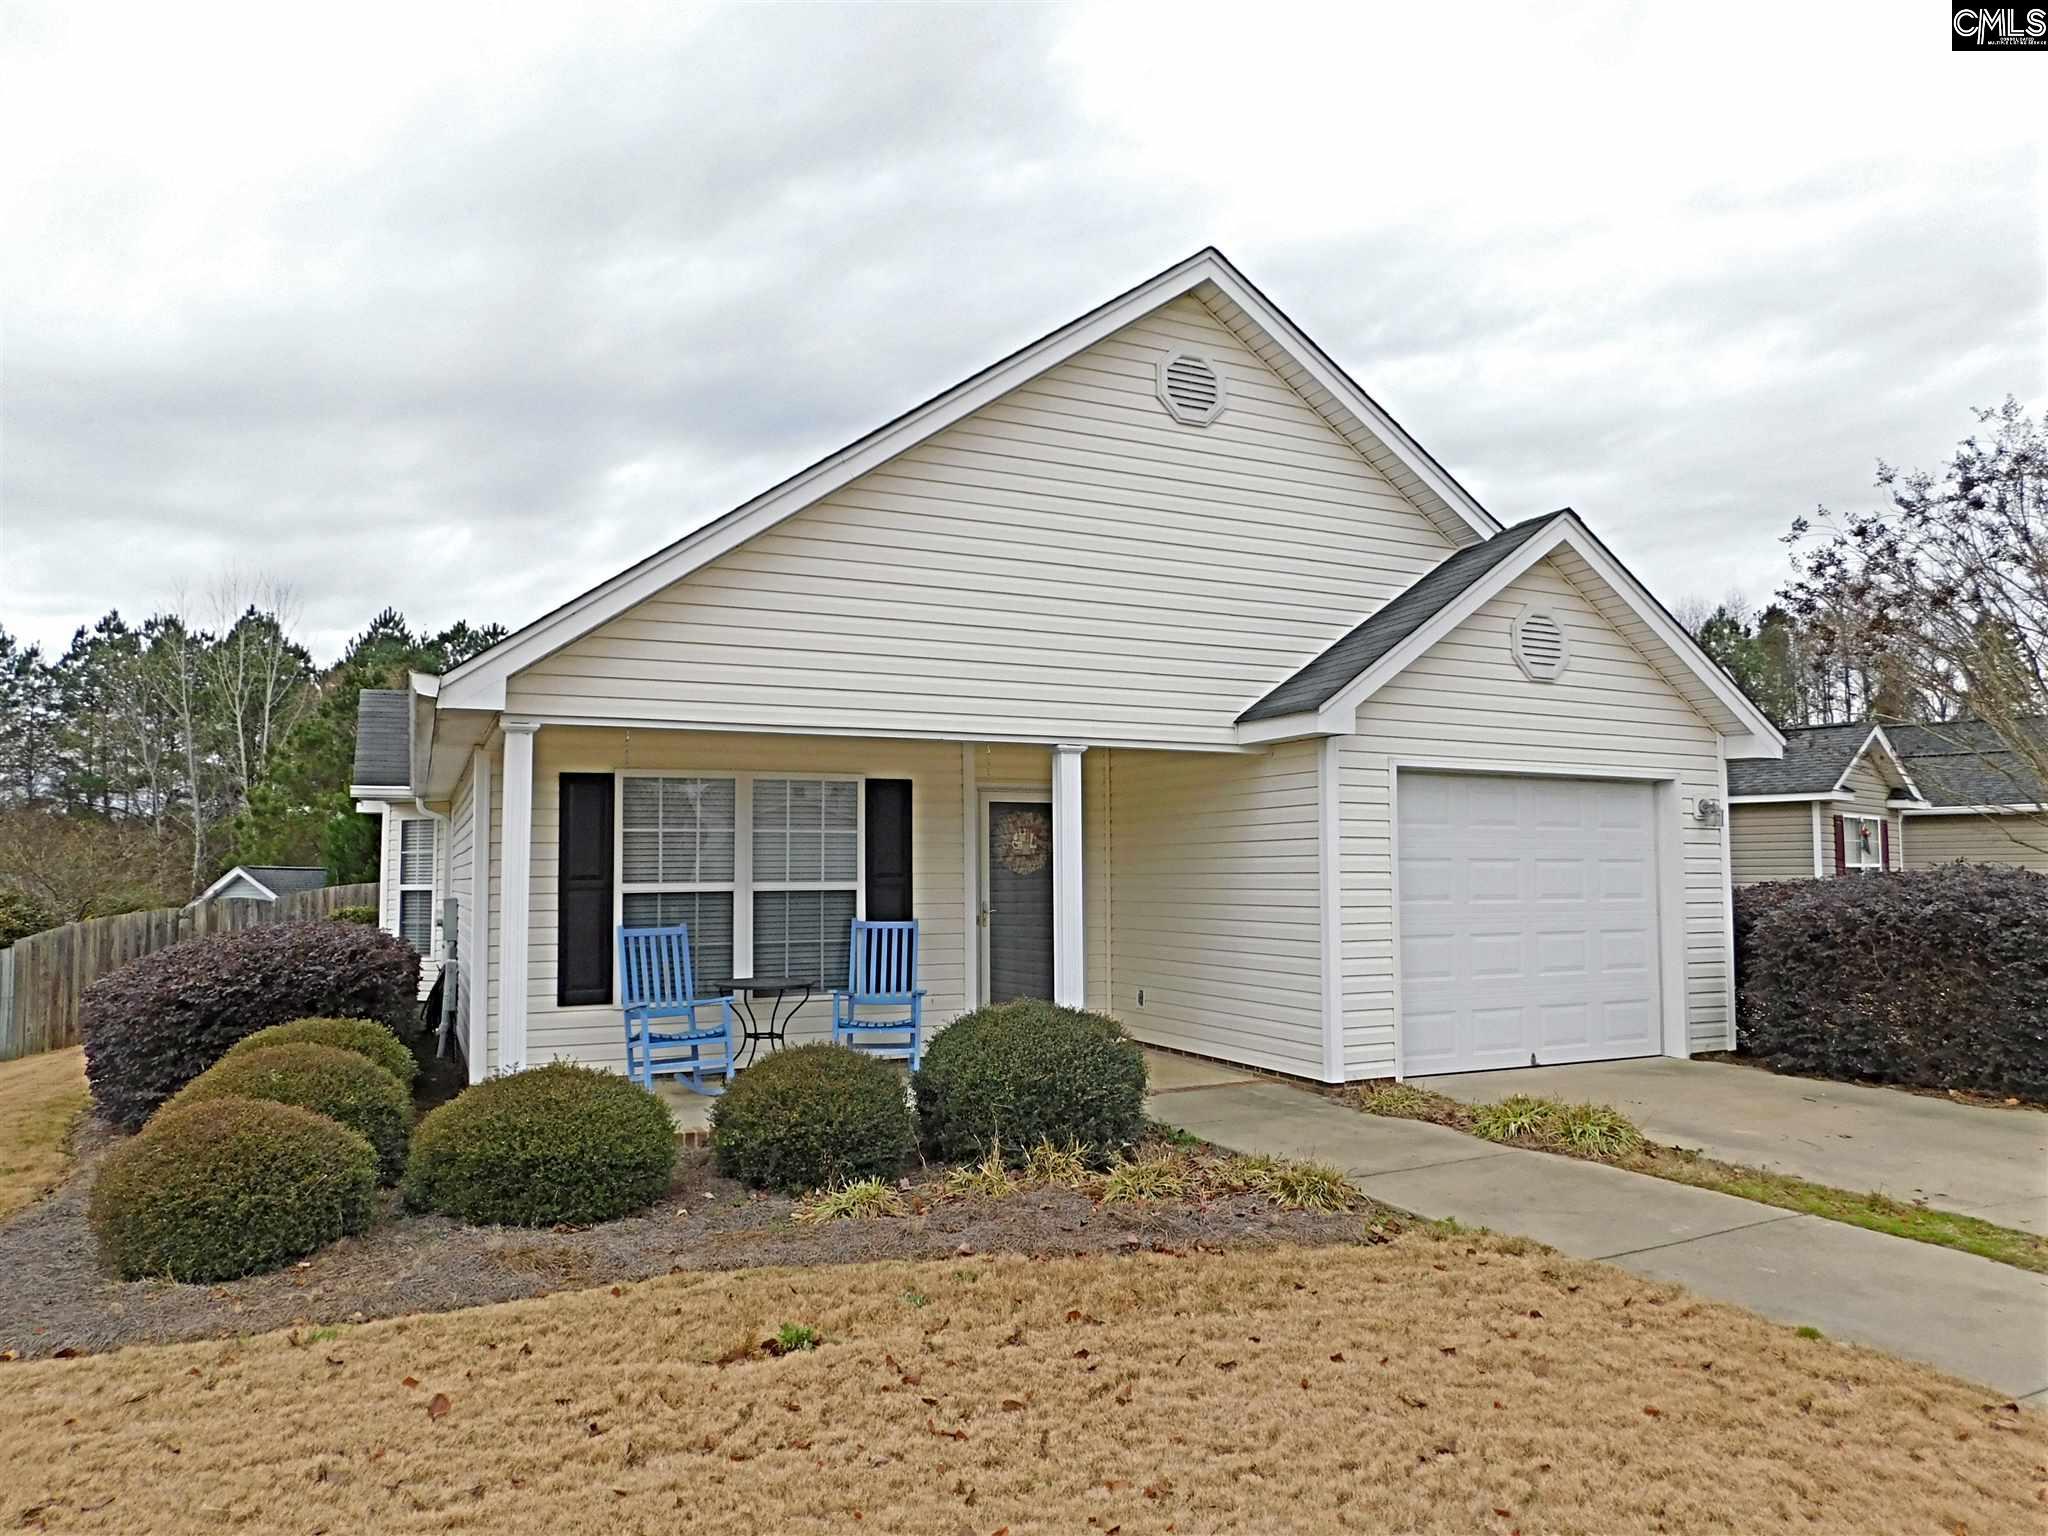 111 Cottontail Batesburg, SC 29006